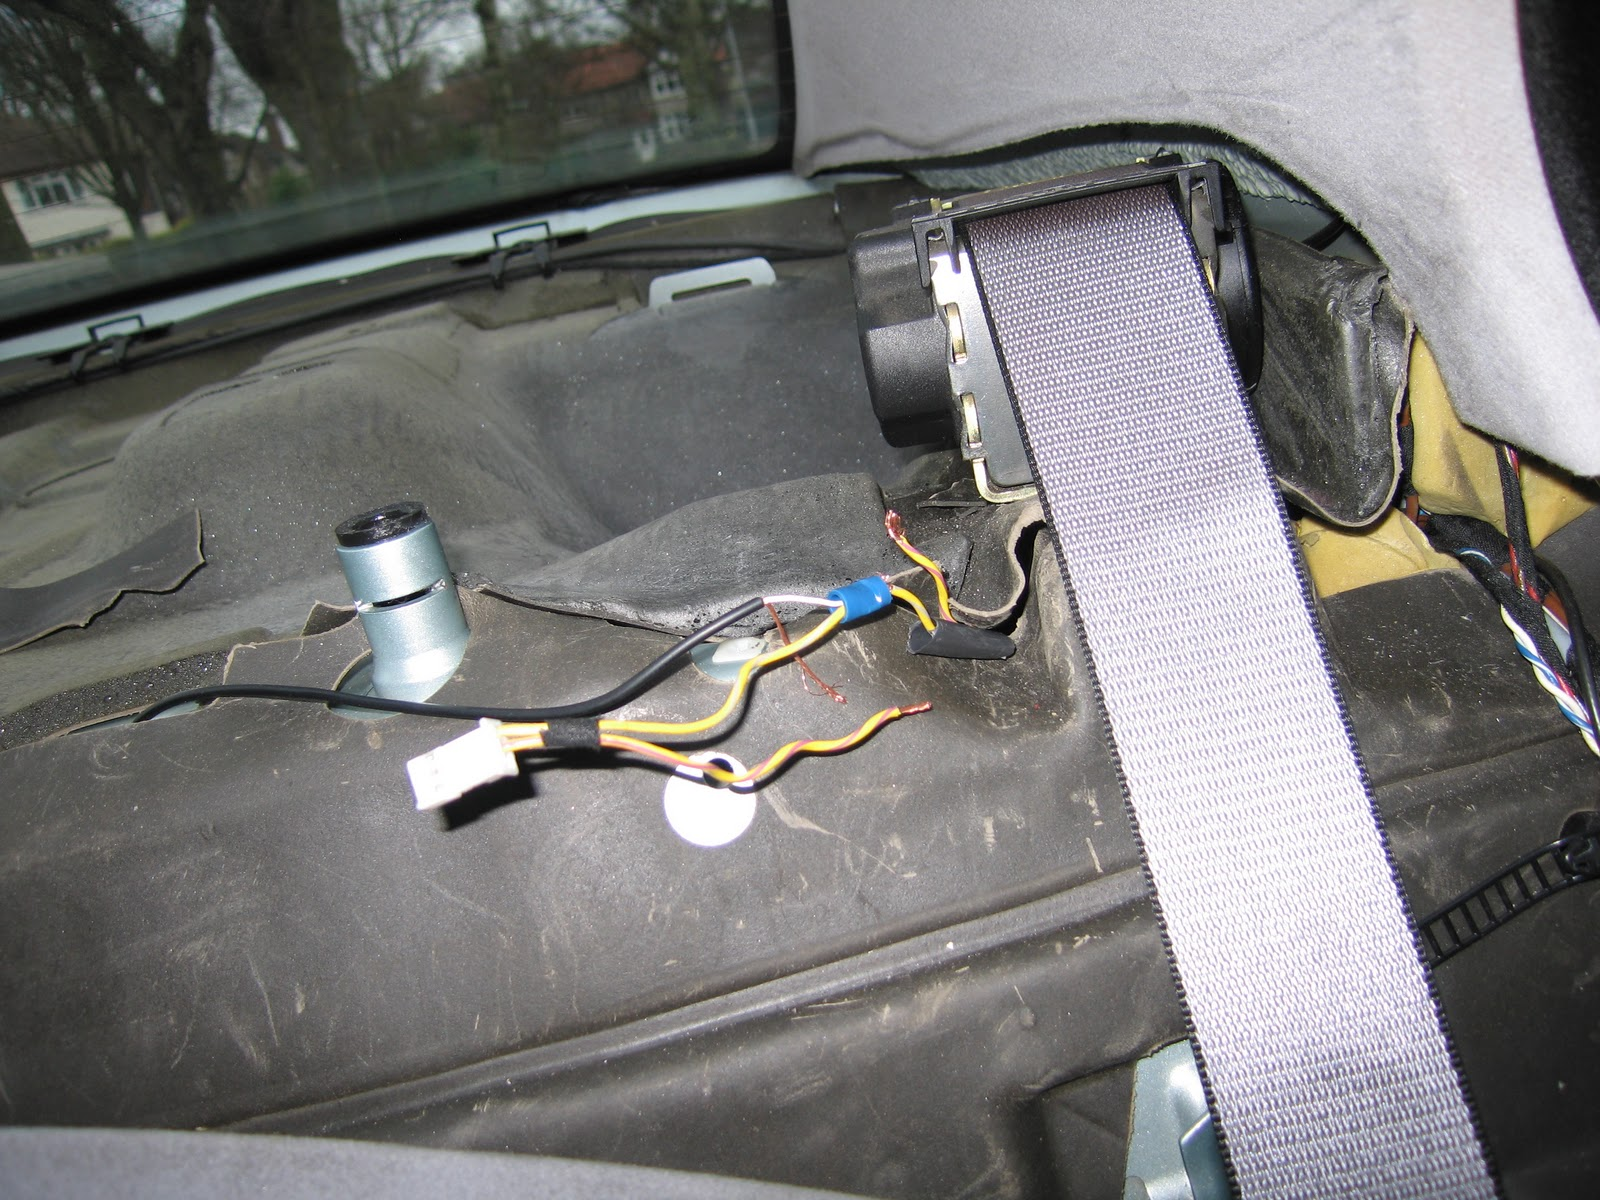 Bmw Audio Wiring Diagram E39 True And False Pelvis Beemer Lab Amp Subs Into Standard